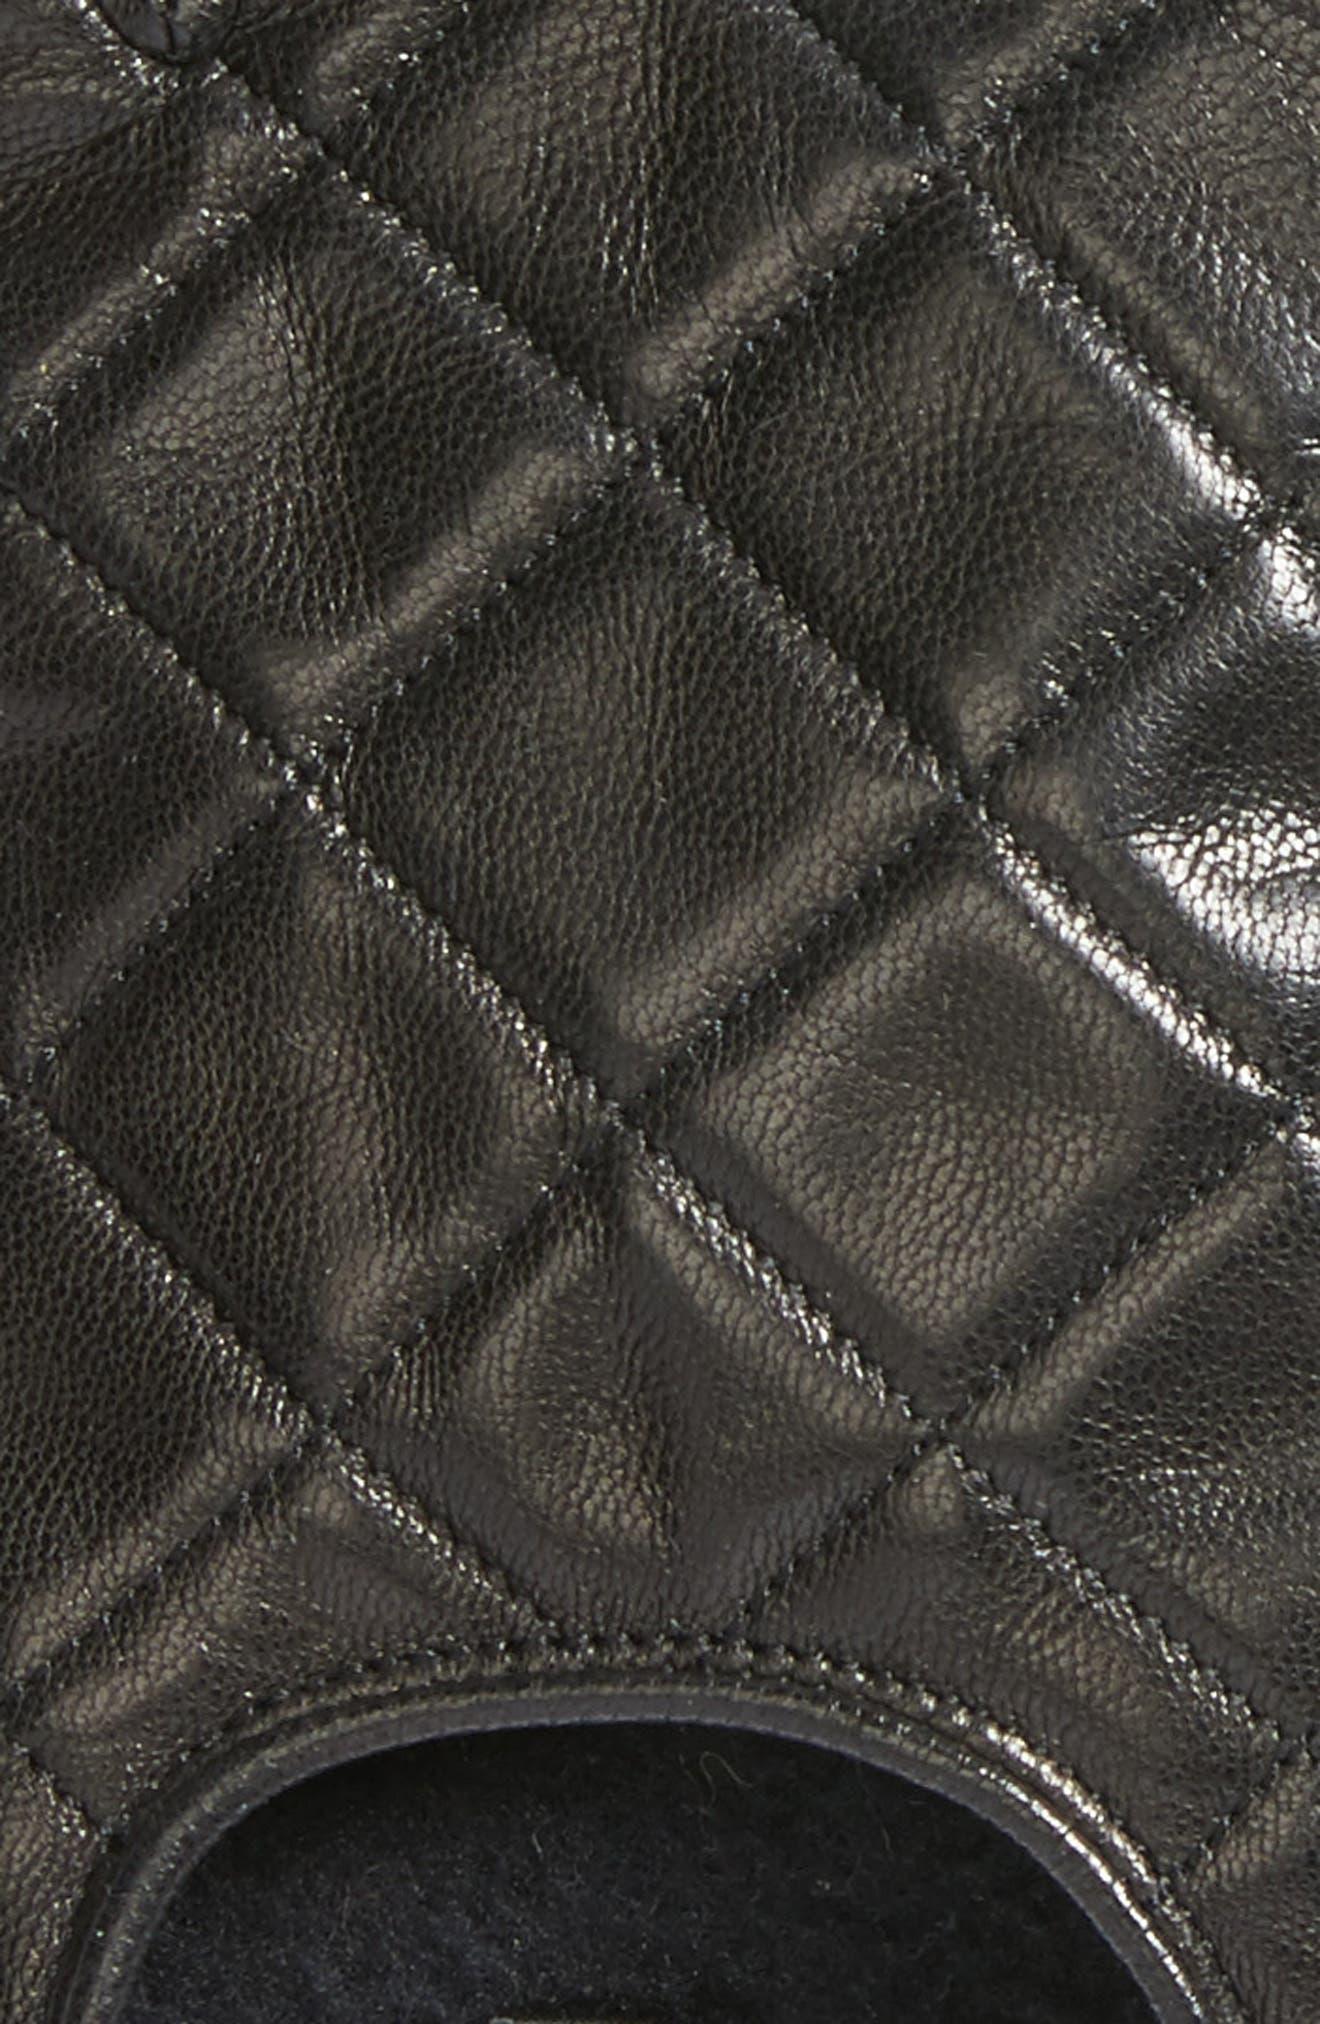 Alternate Image 2  - Rebecca Minkoff Quilted Goatskin Leather Fingerless Gloves